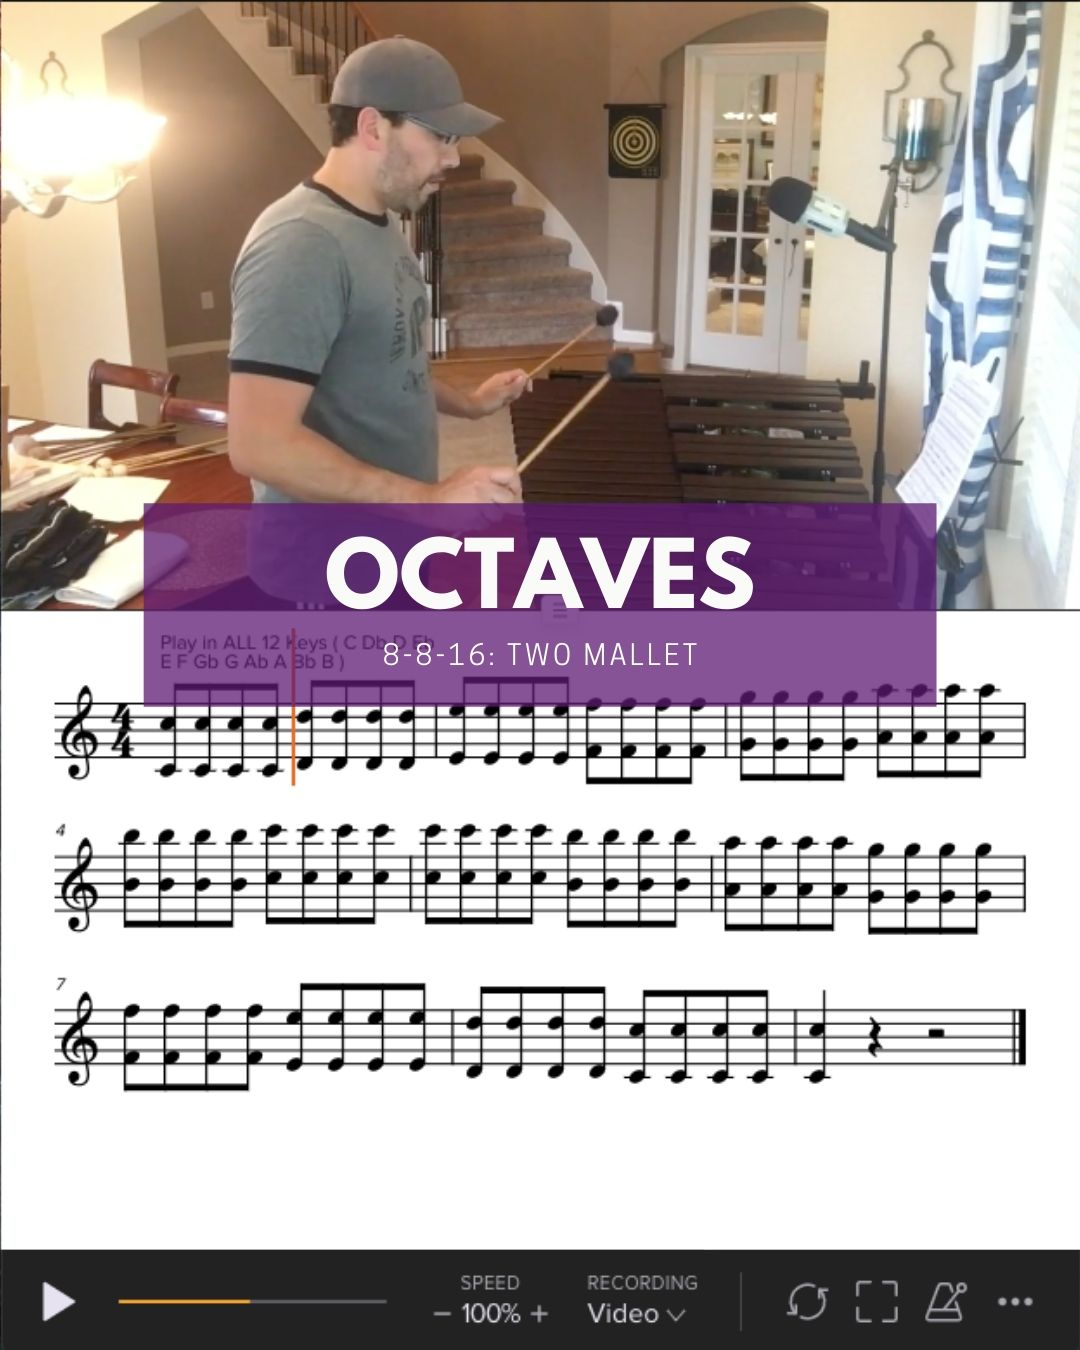 Octaves